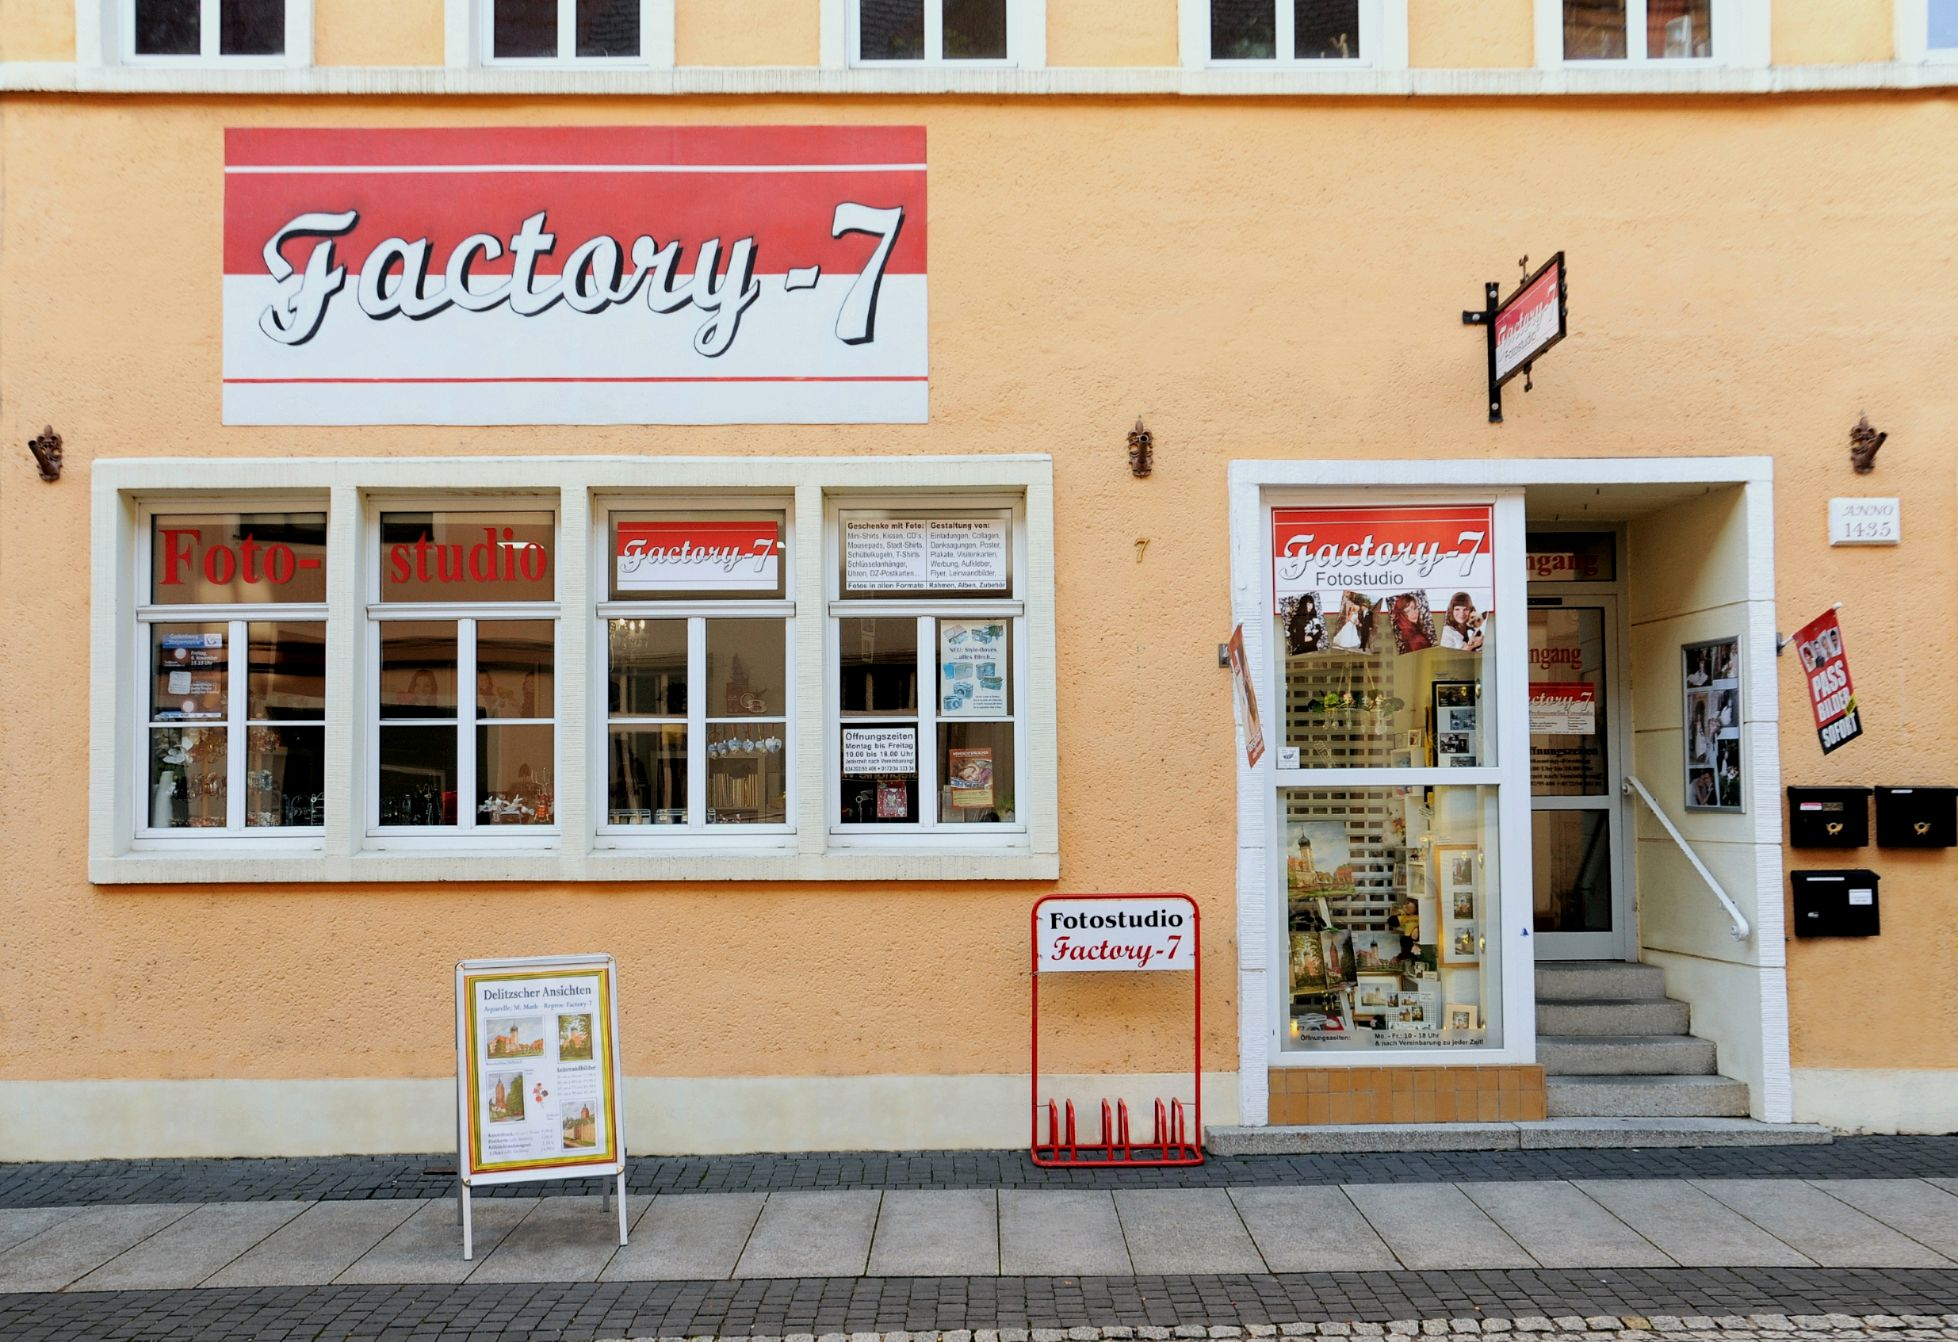 Fotostudio Factory-7